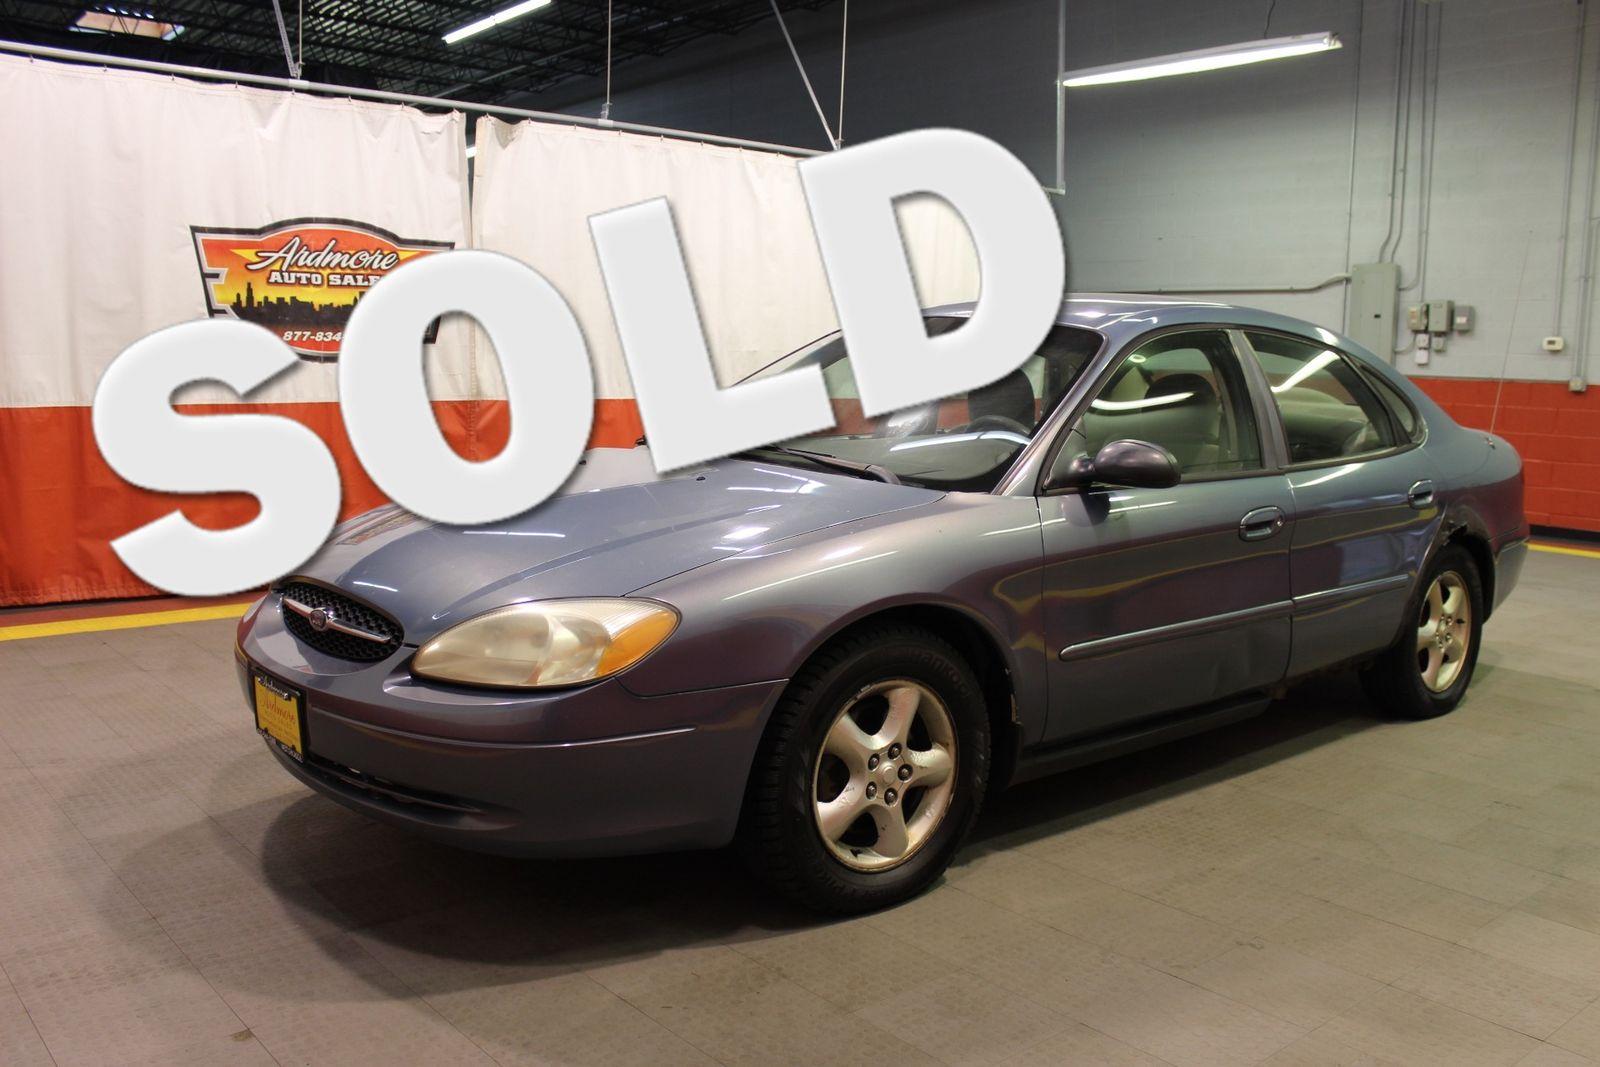 2001 ford taurus ses city illinois ardmore auto sales in west chicago illinois